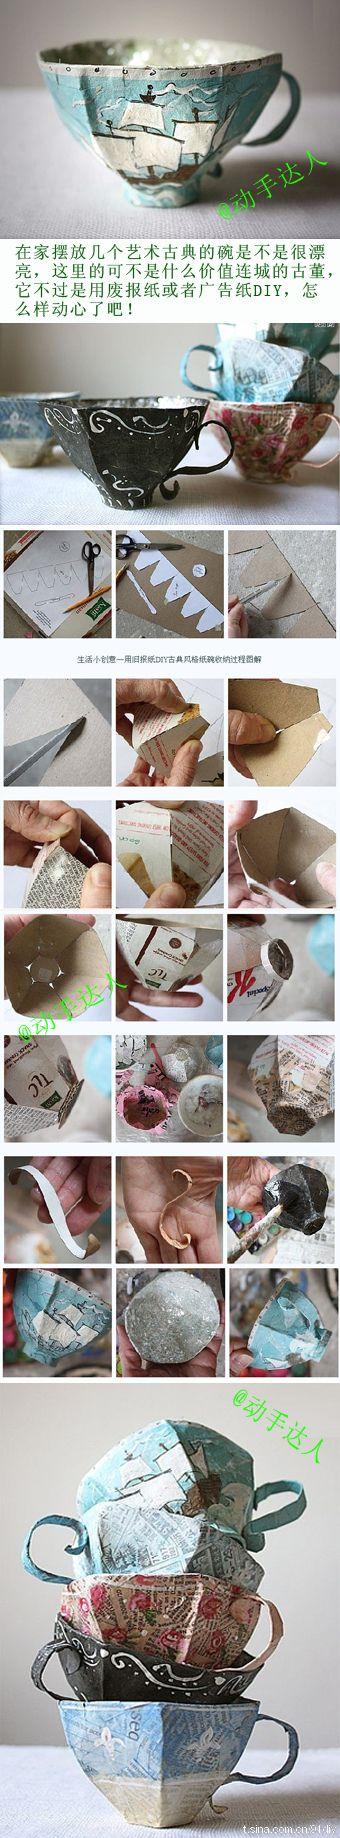 papier mache teacups    full (English) tutorial here:    http://annwood.net/blog/2011/02/24/paper-mache-teacup-pattern/